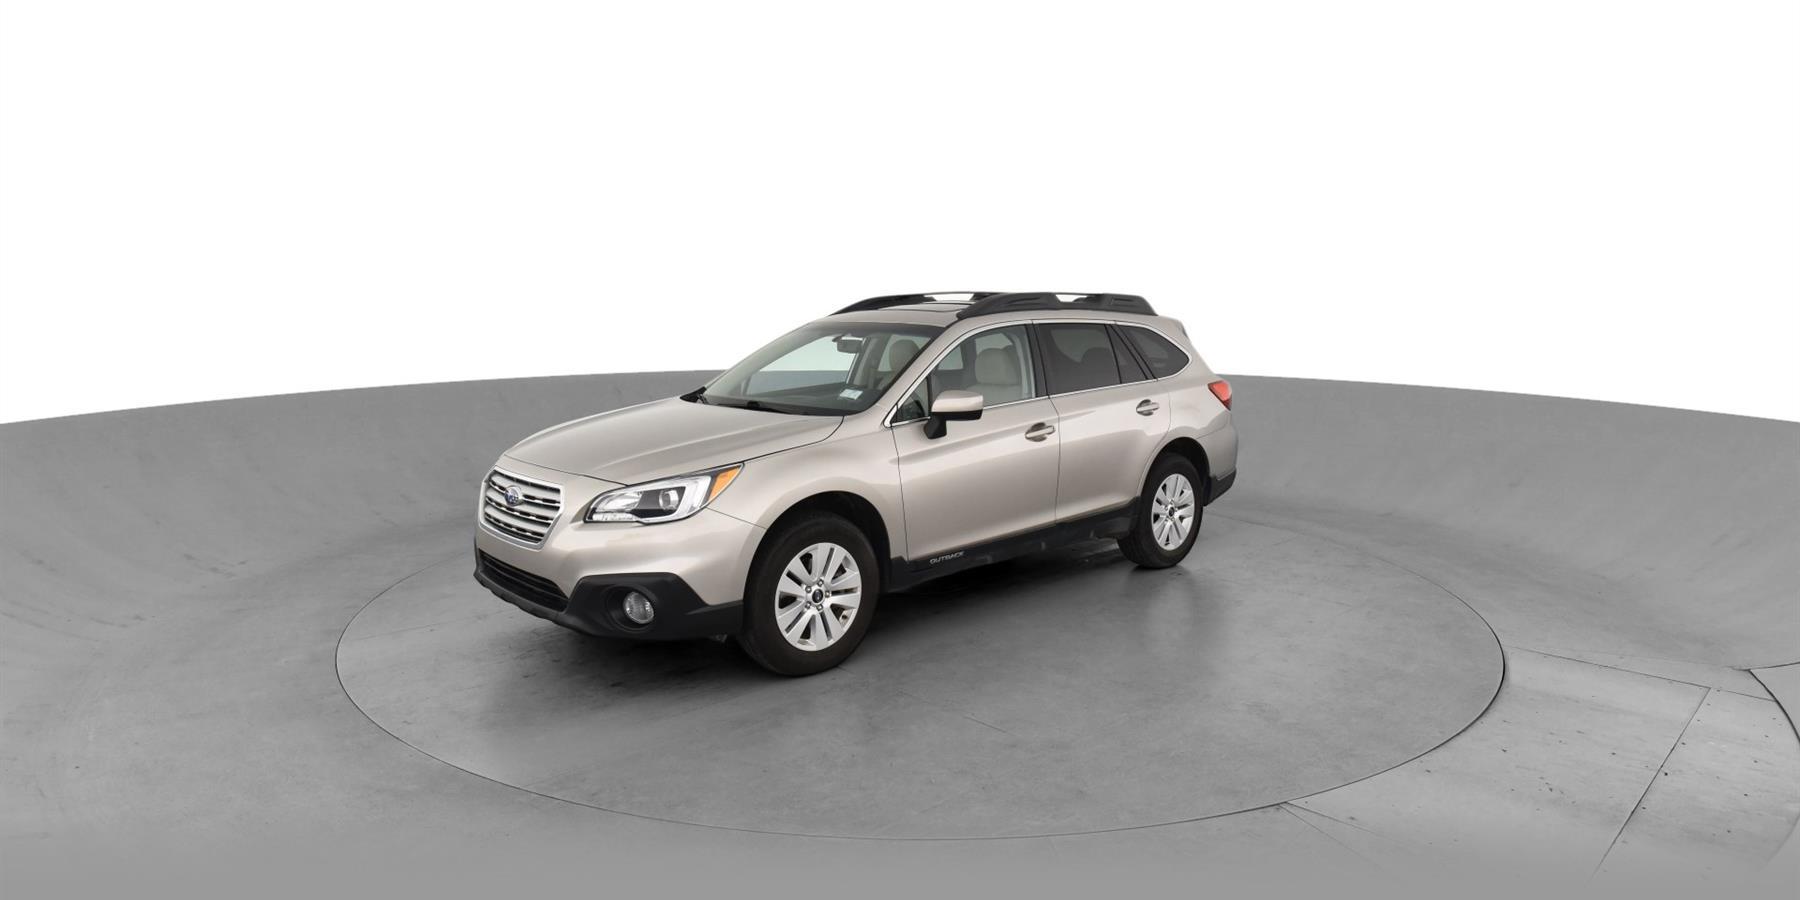 2017 Subaru Outback 2 5i Premium Wagon 4D for Sale | Carvana®